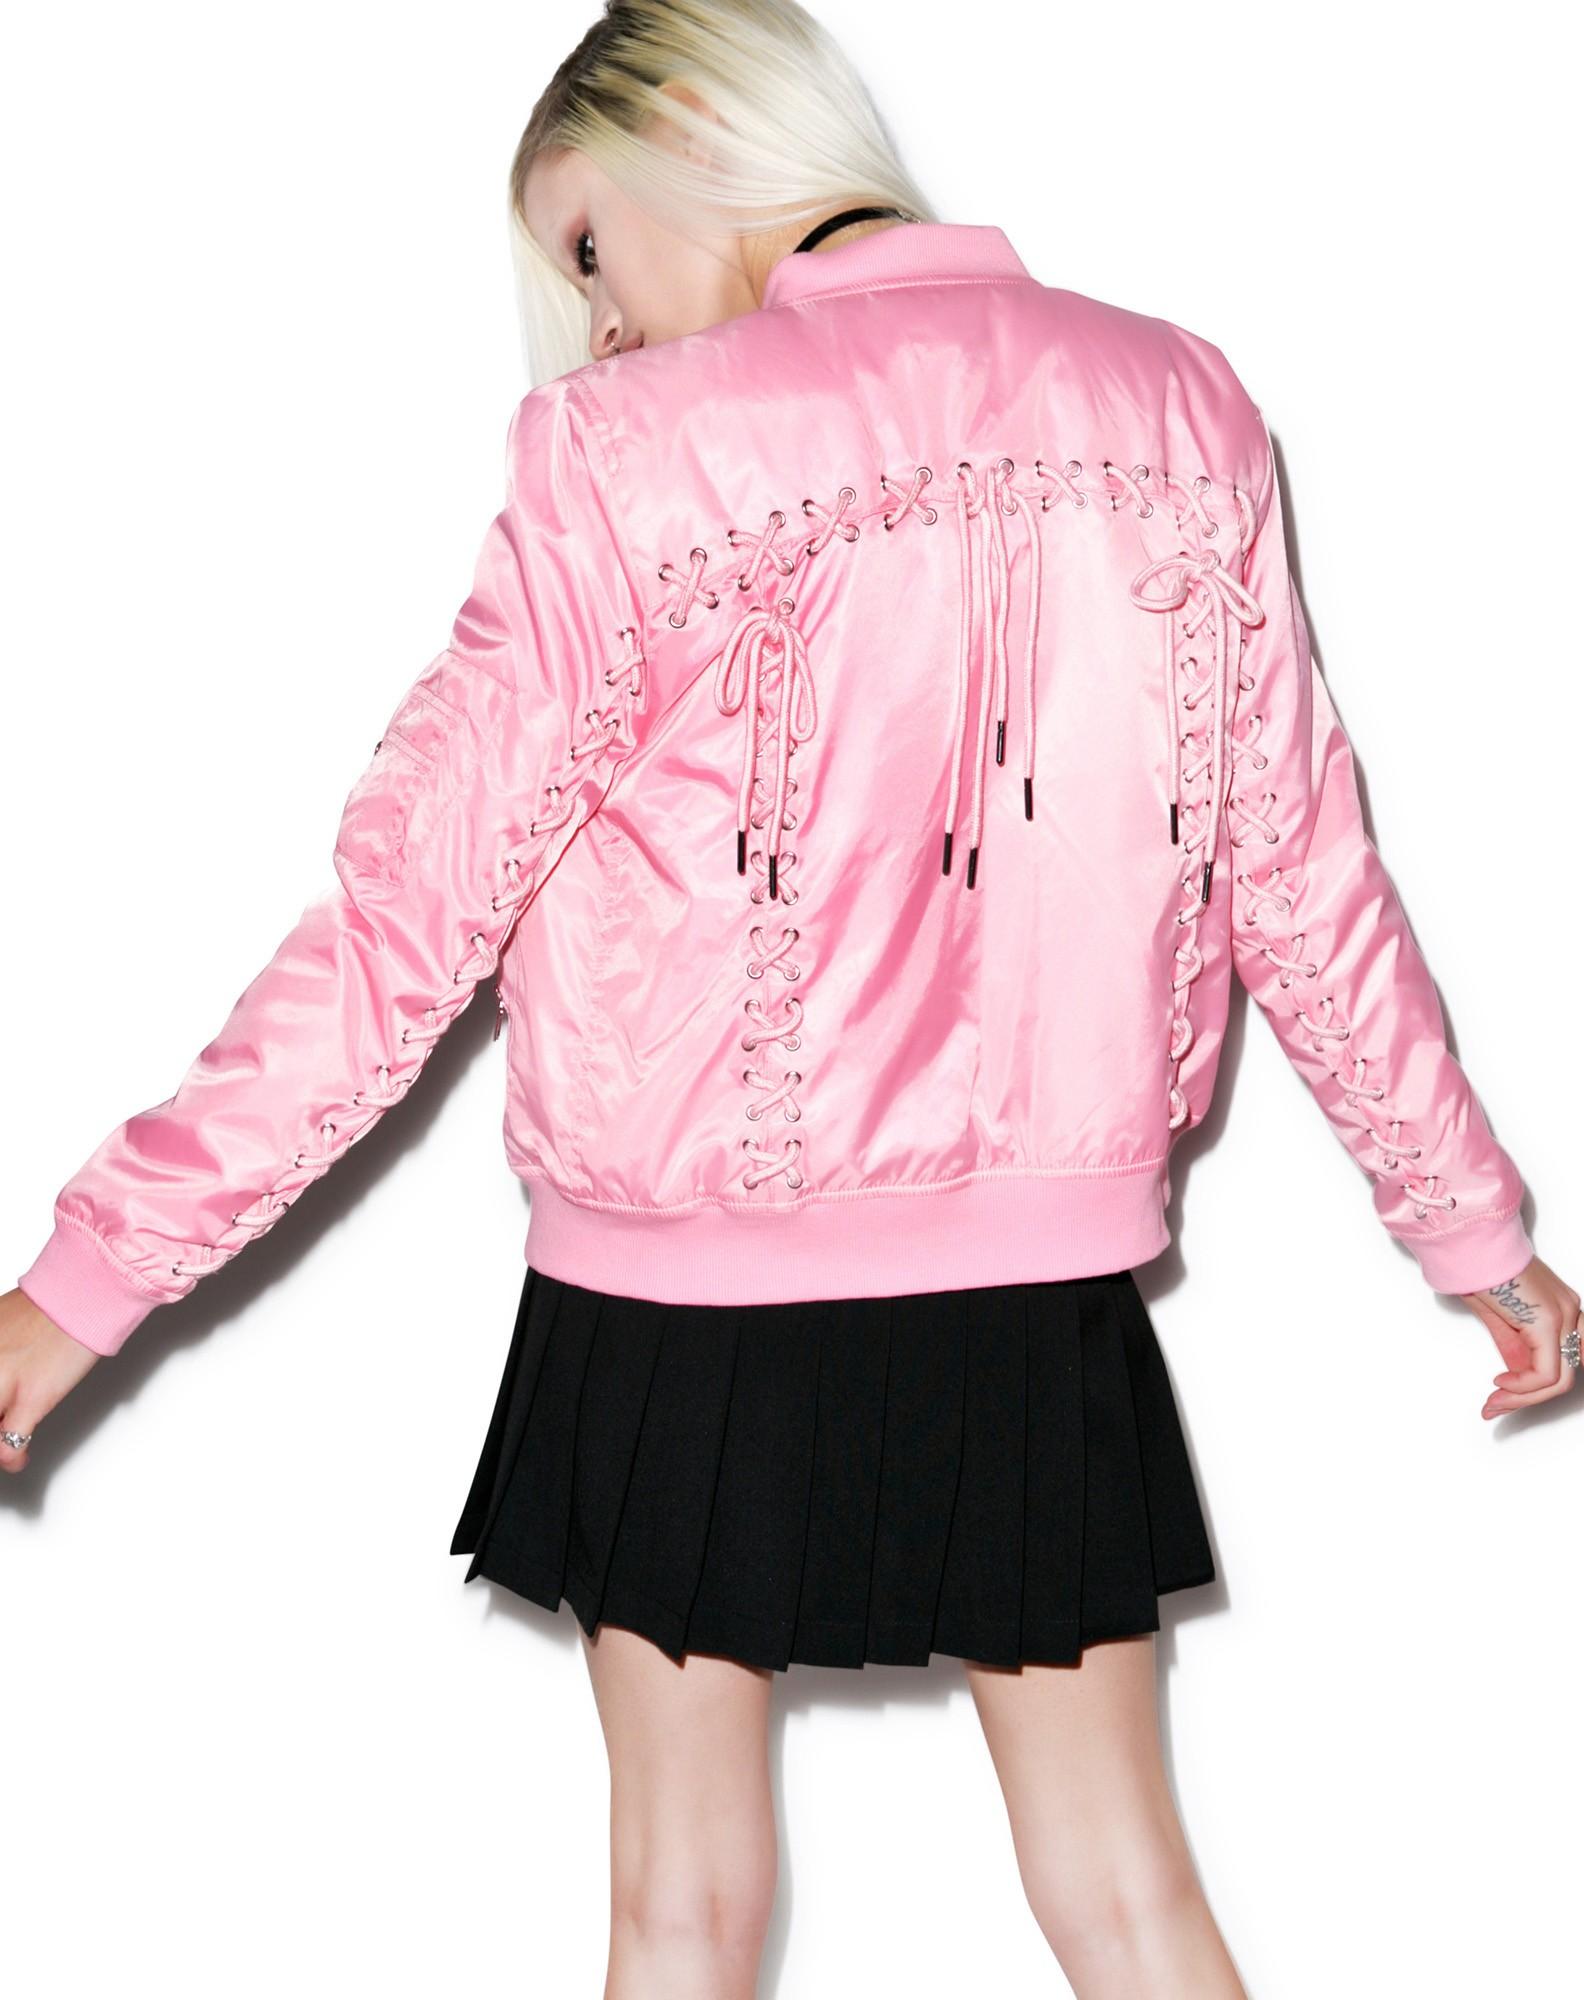 Mood Bomber Jackets: Current Mood Corset Princess Bomber Jacket